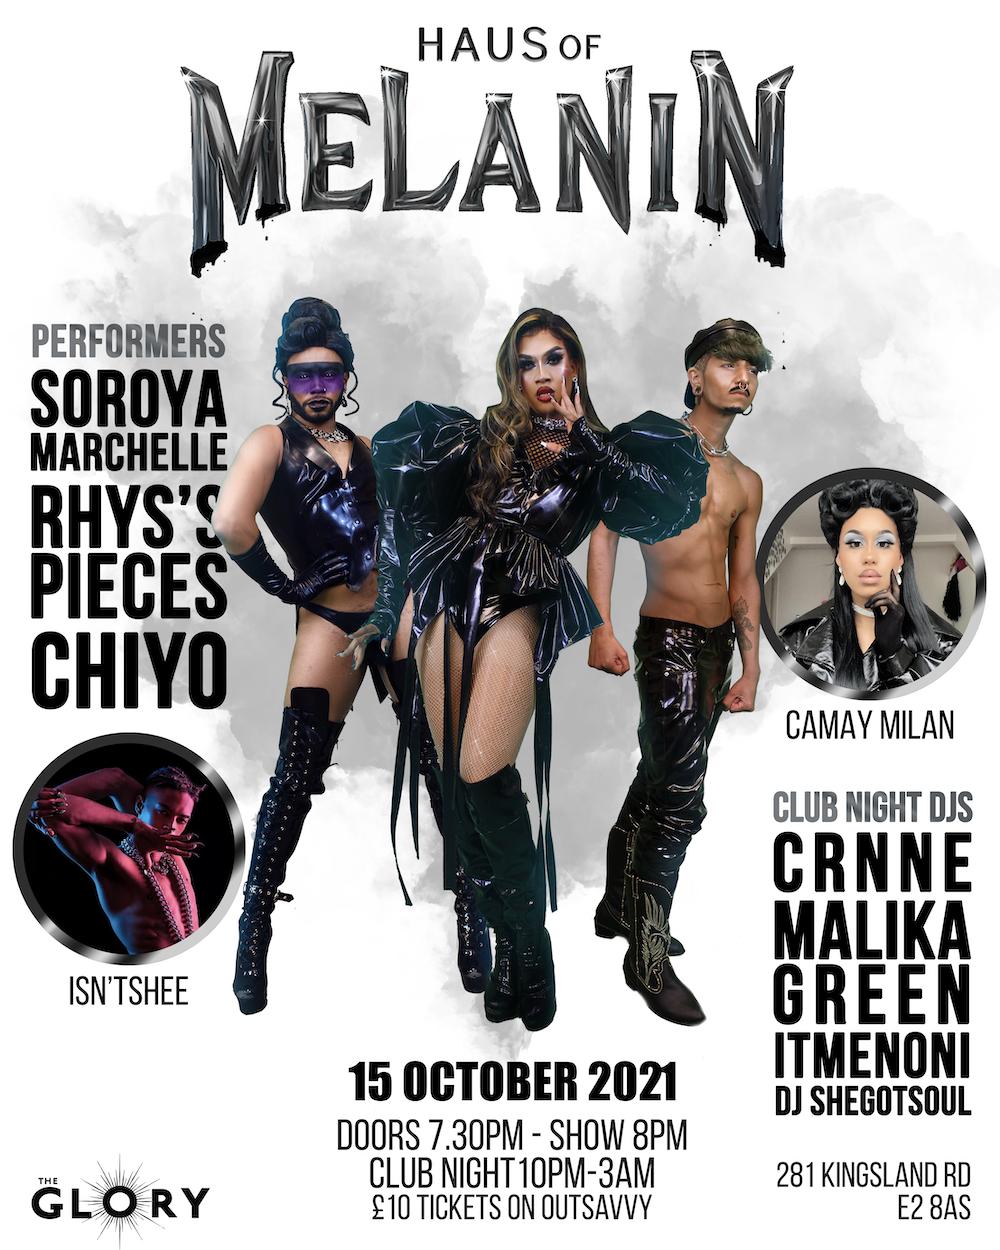 Haus of Melanin Cabaret